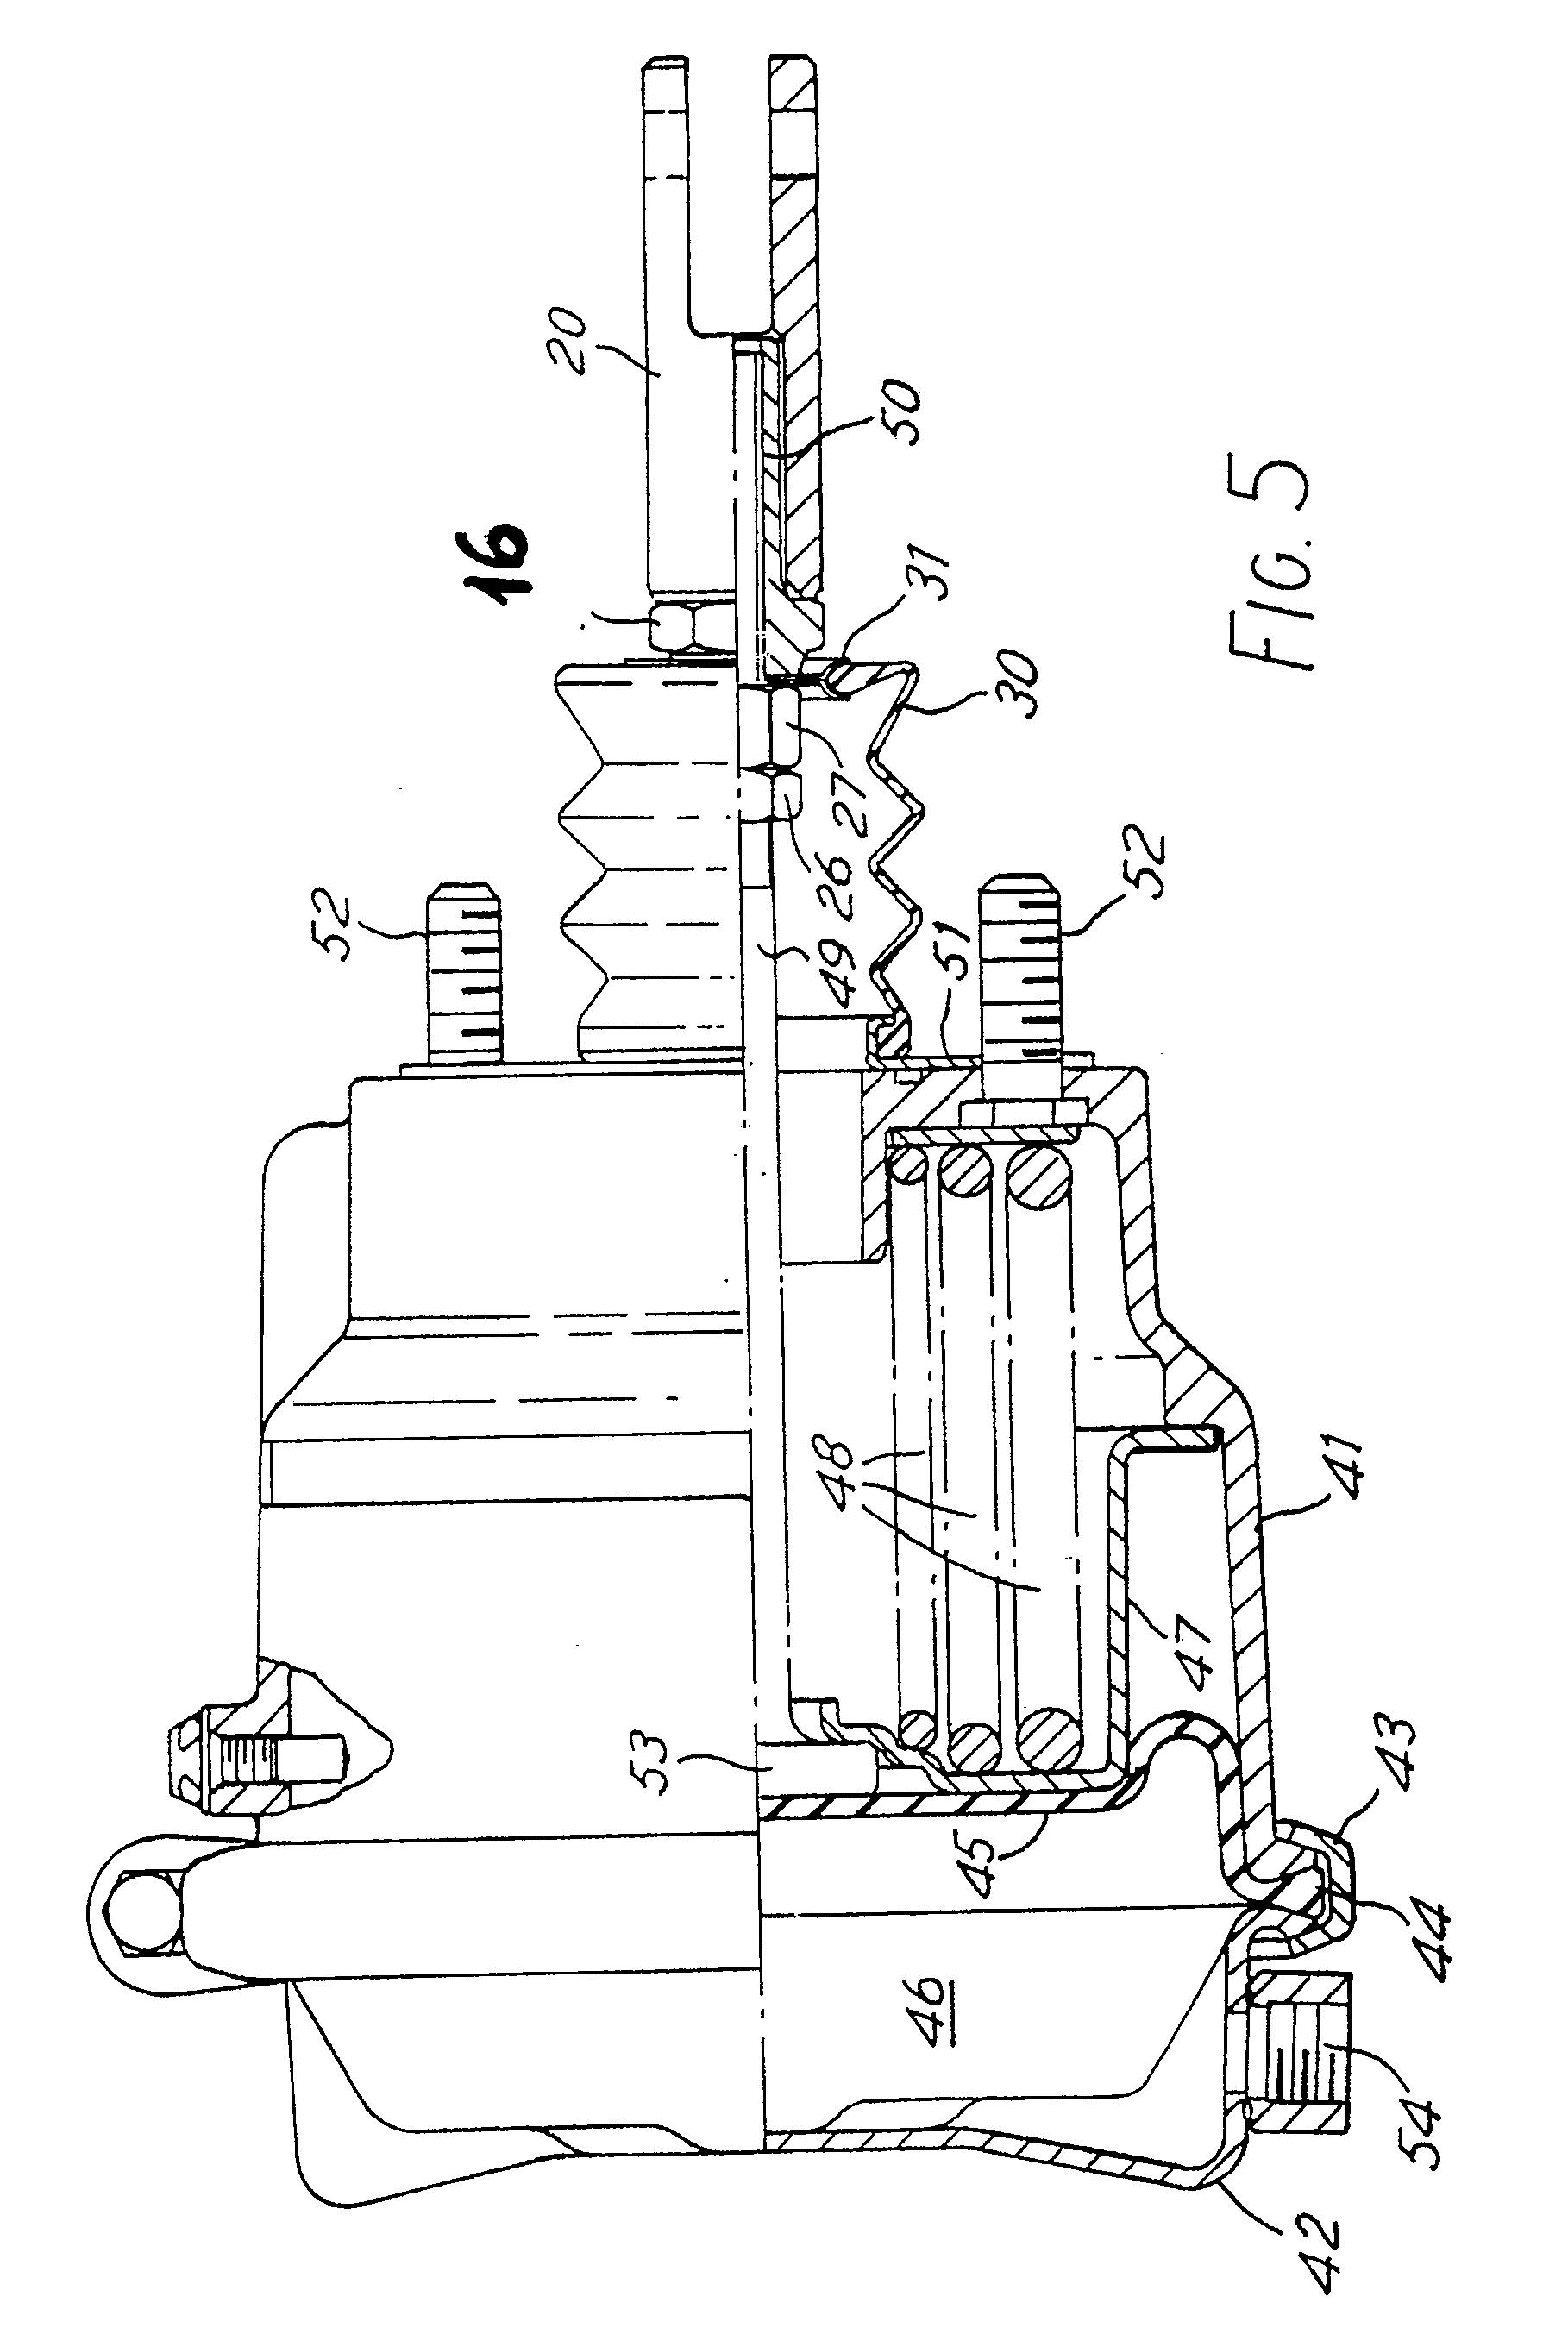 专利ep0260804b1 - verbindung